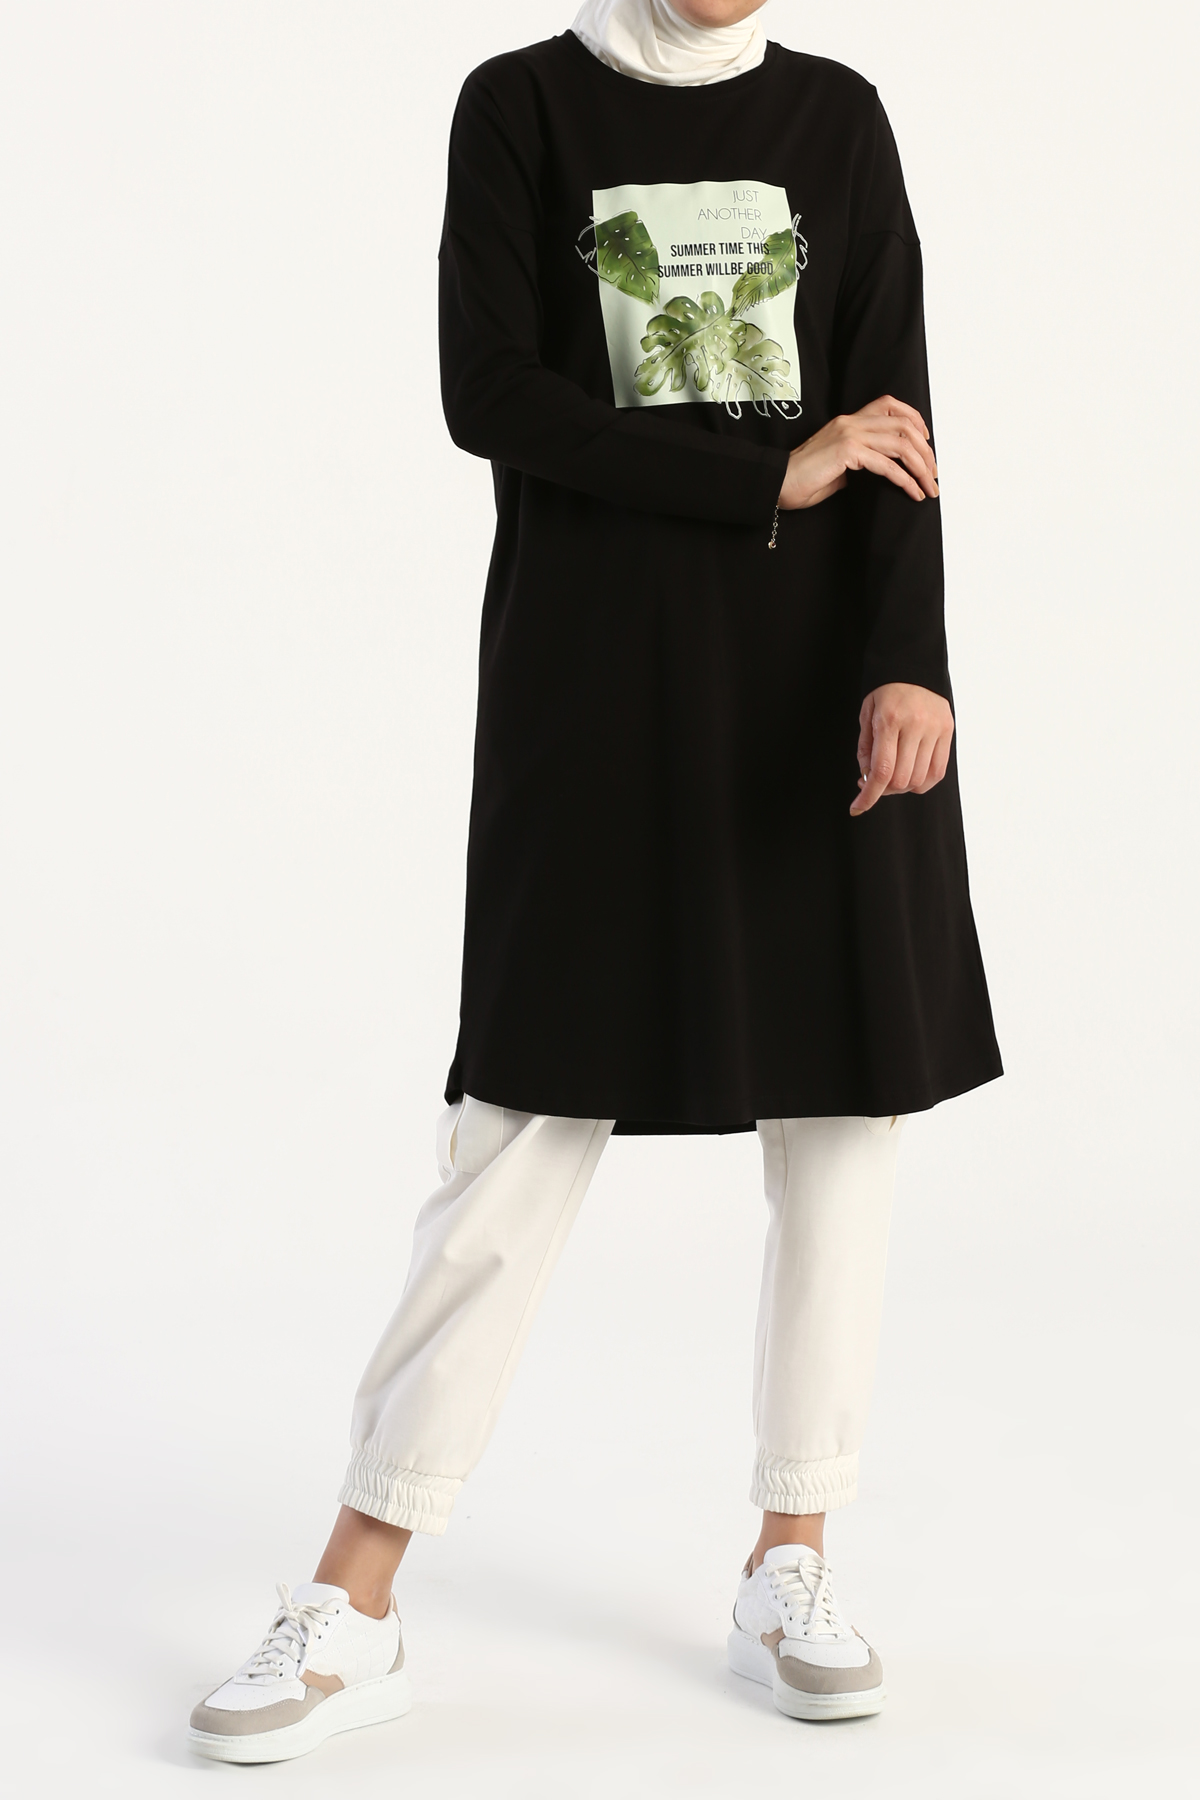 Palm Printed Long Sleeve T-shirt